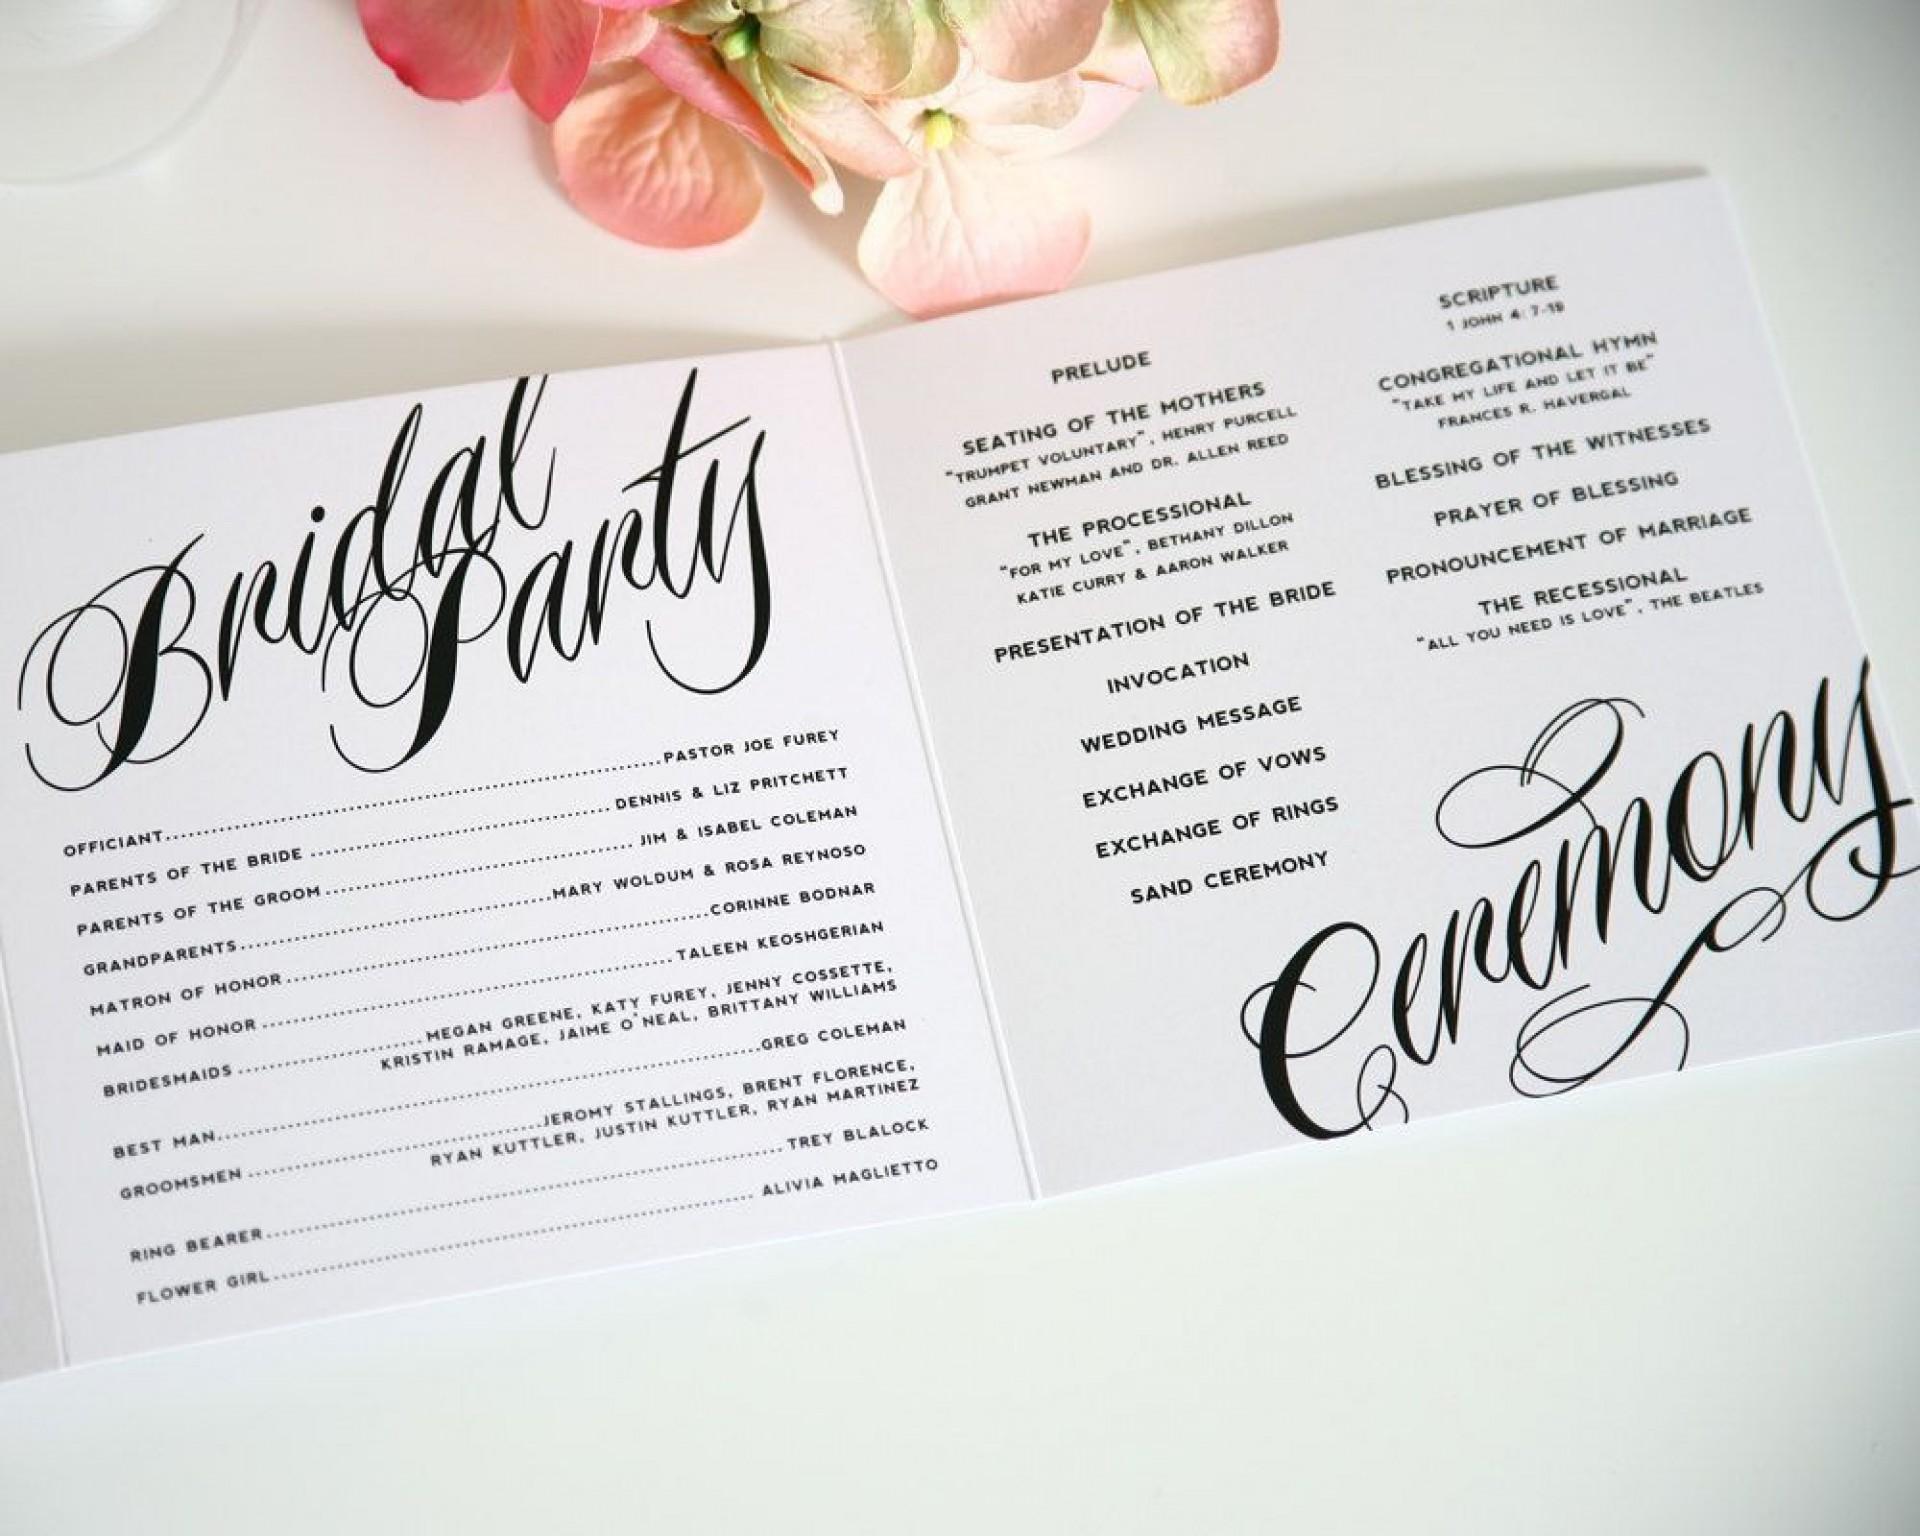 004 Singular Trifold Wedding Program Template Picture  Tri Fold Word Folded Example1920